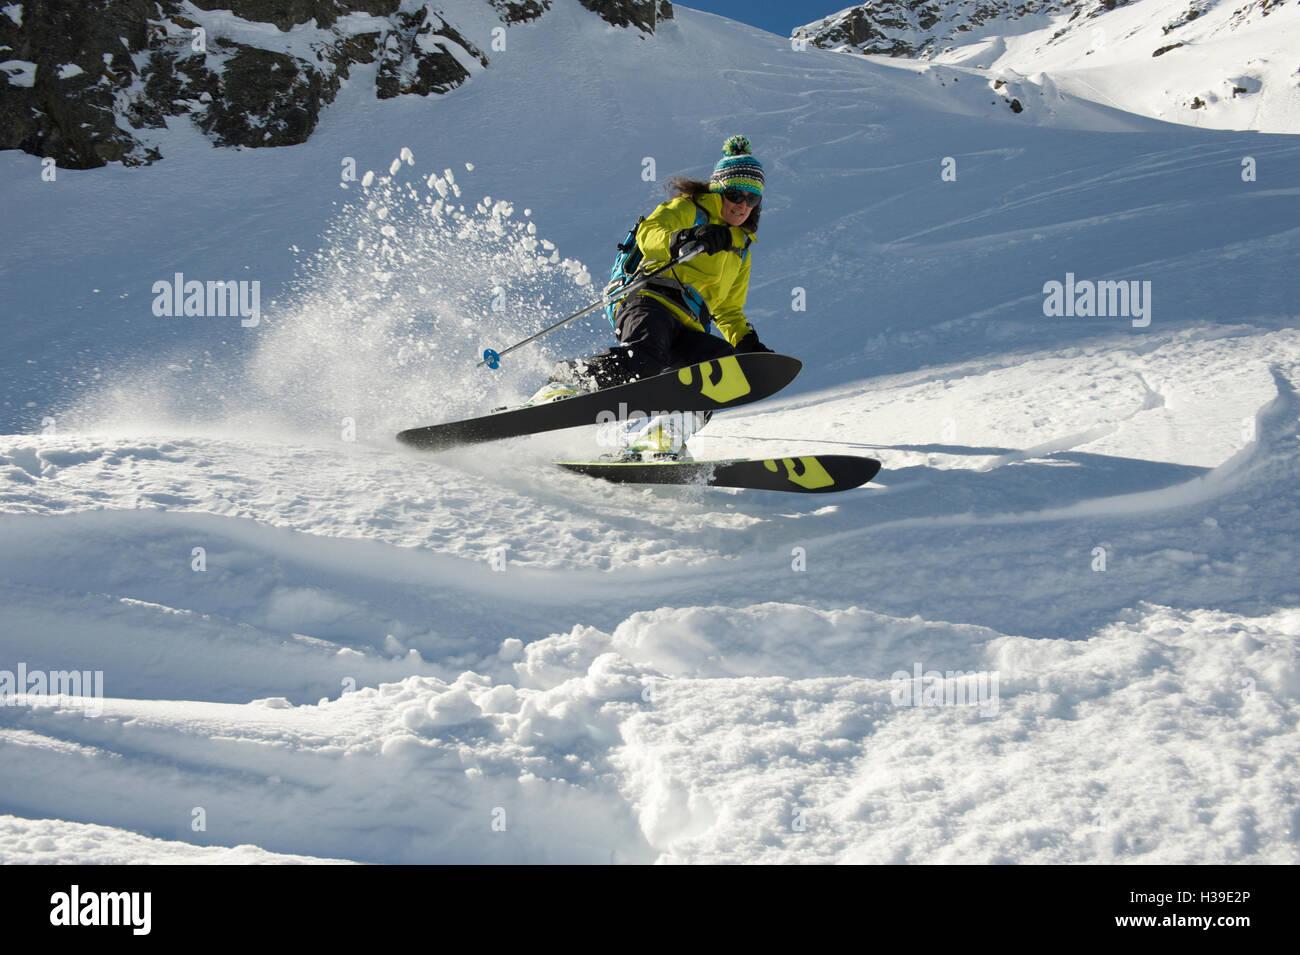 Woman skiing in powder - Stock Image